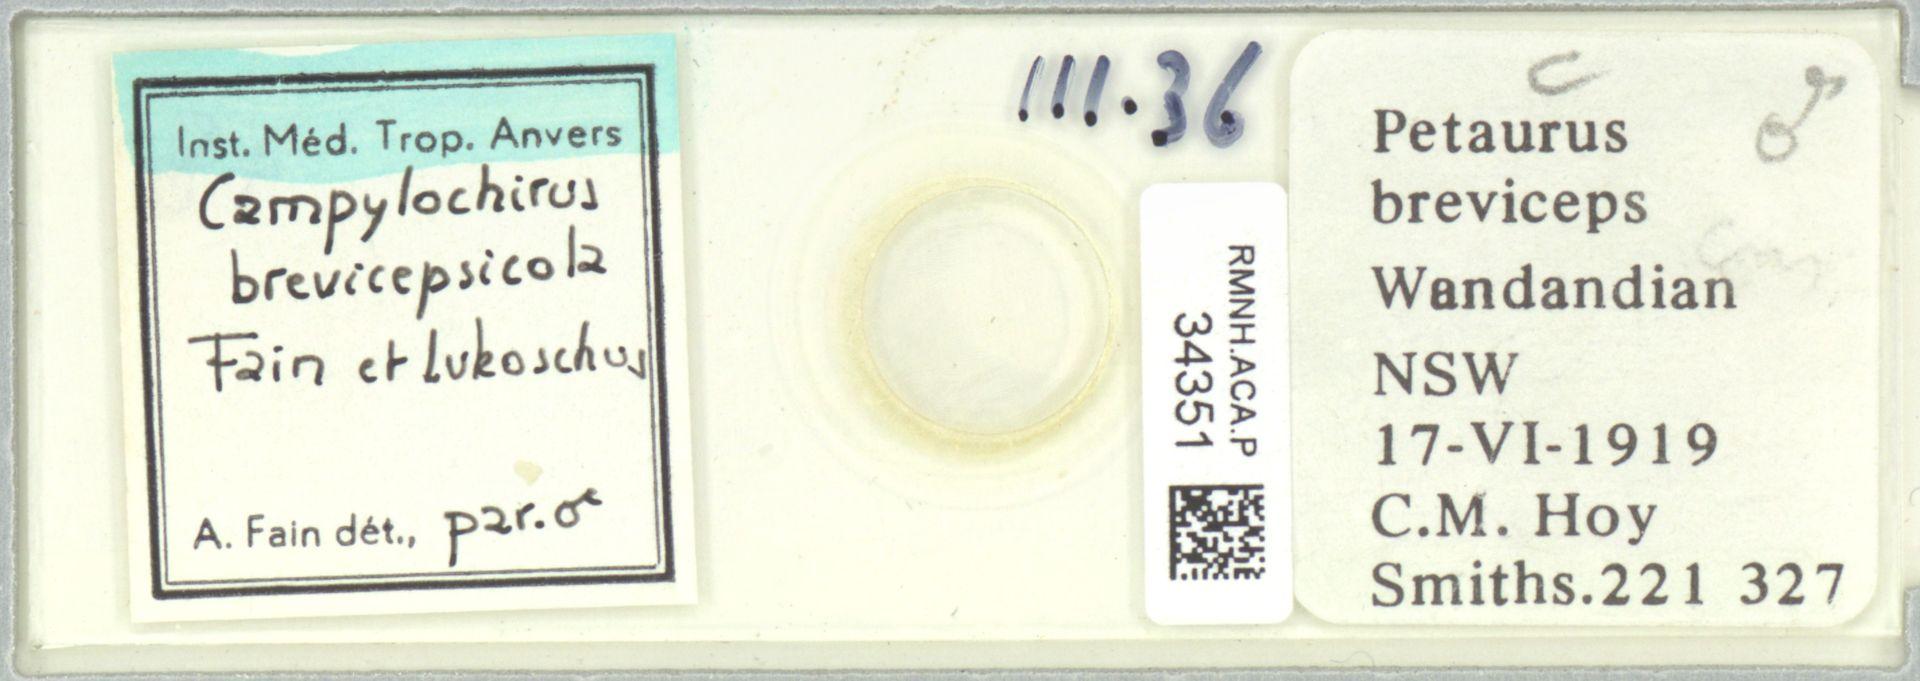 RMNH.ACA.P.34351 | Campylochirus brevicepsicola Fain et Lukoschus